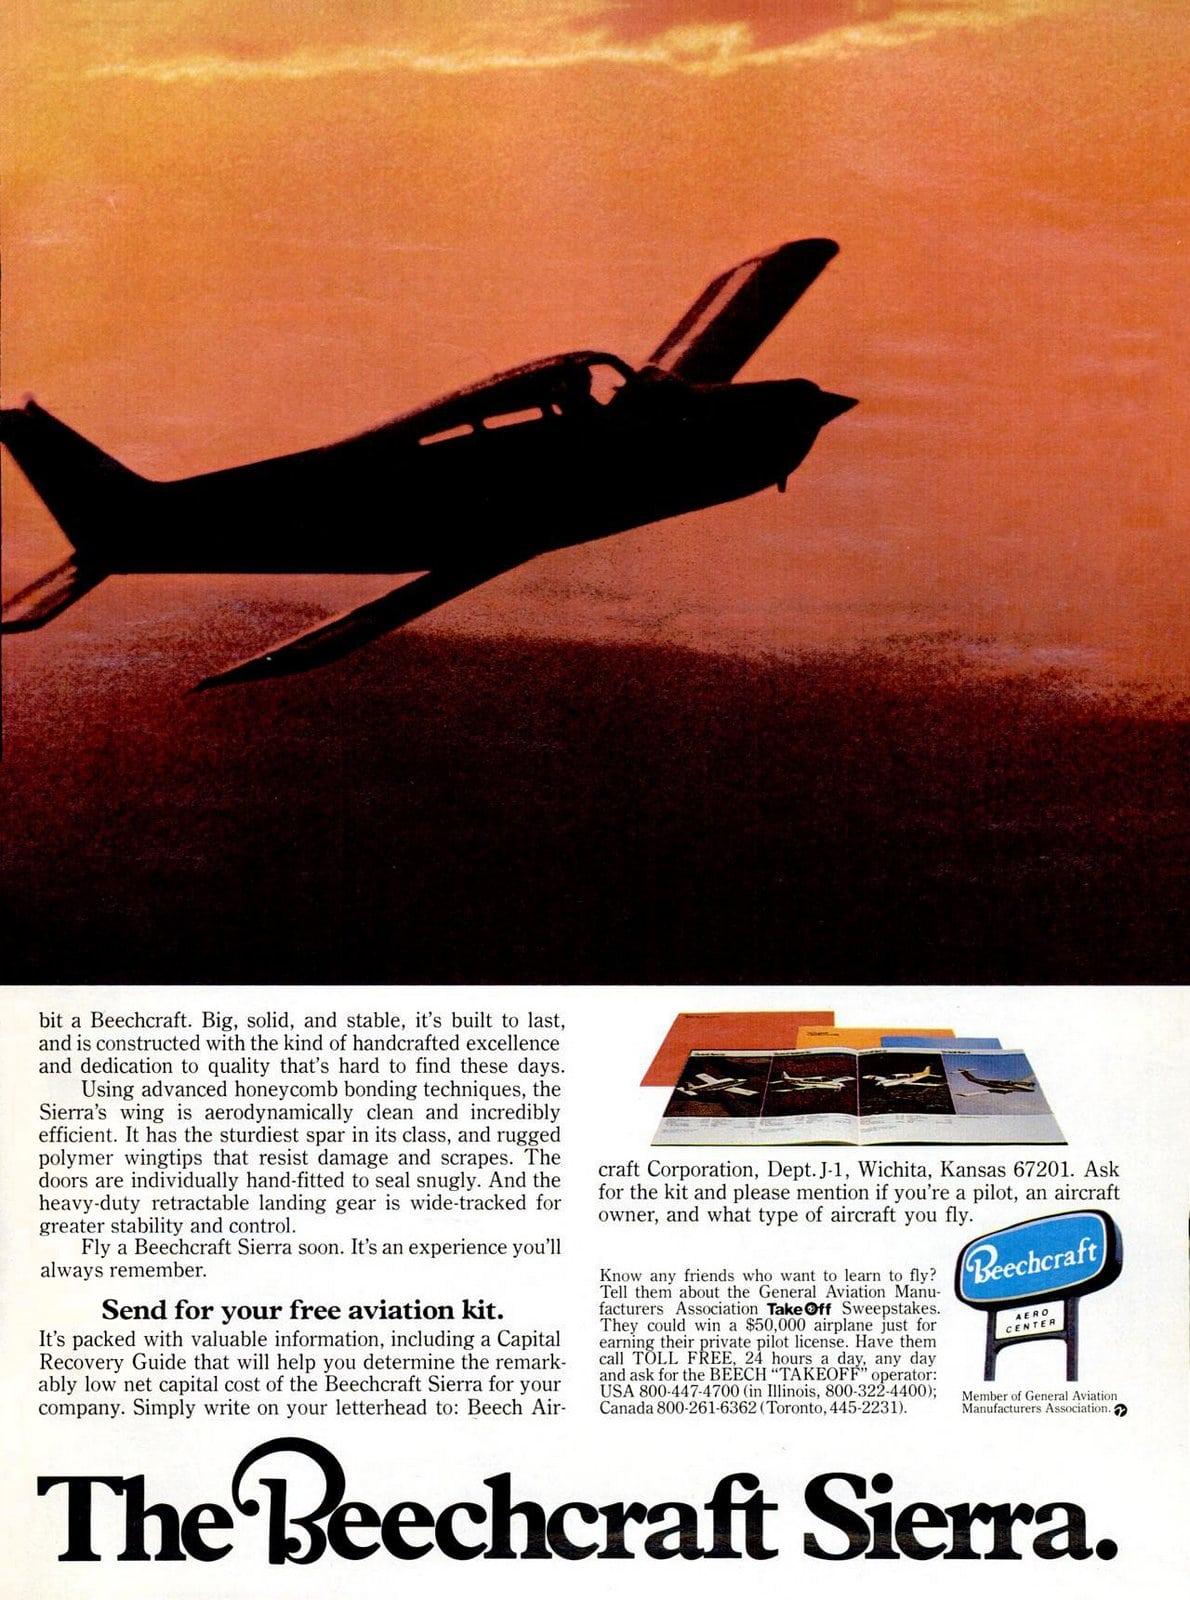 Vintage 1970s Beechcraft Sierra airplanes from 1978 (1)